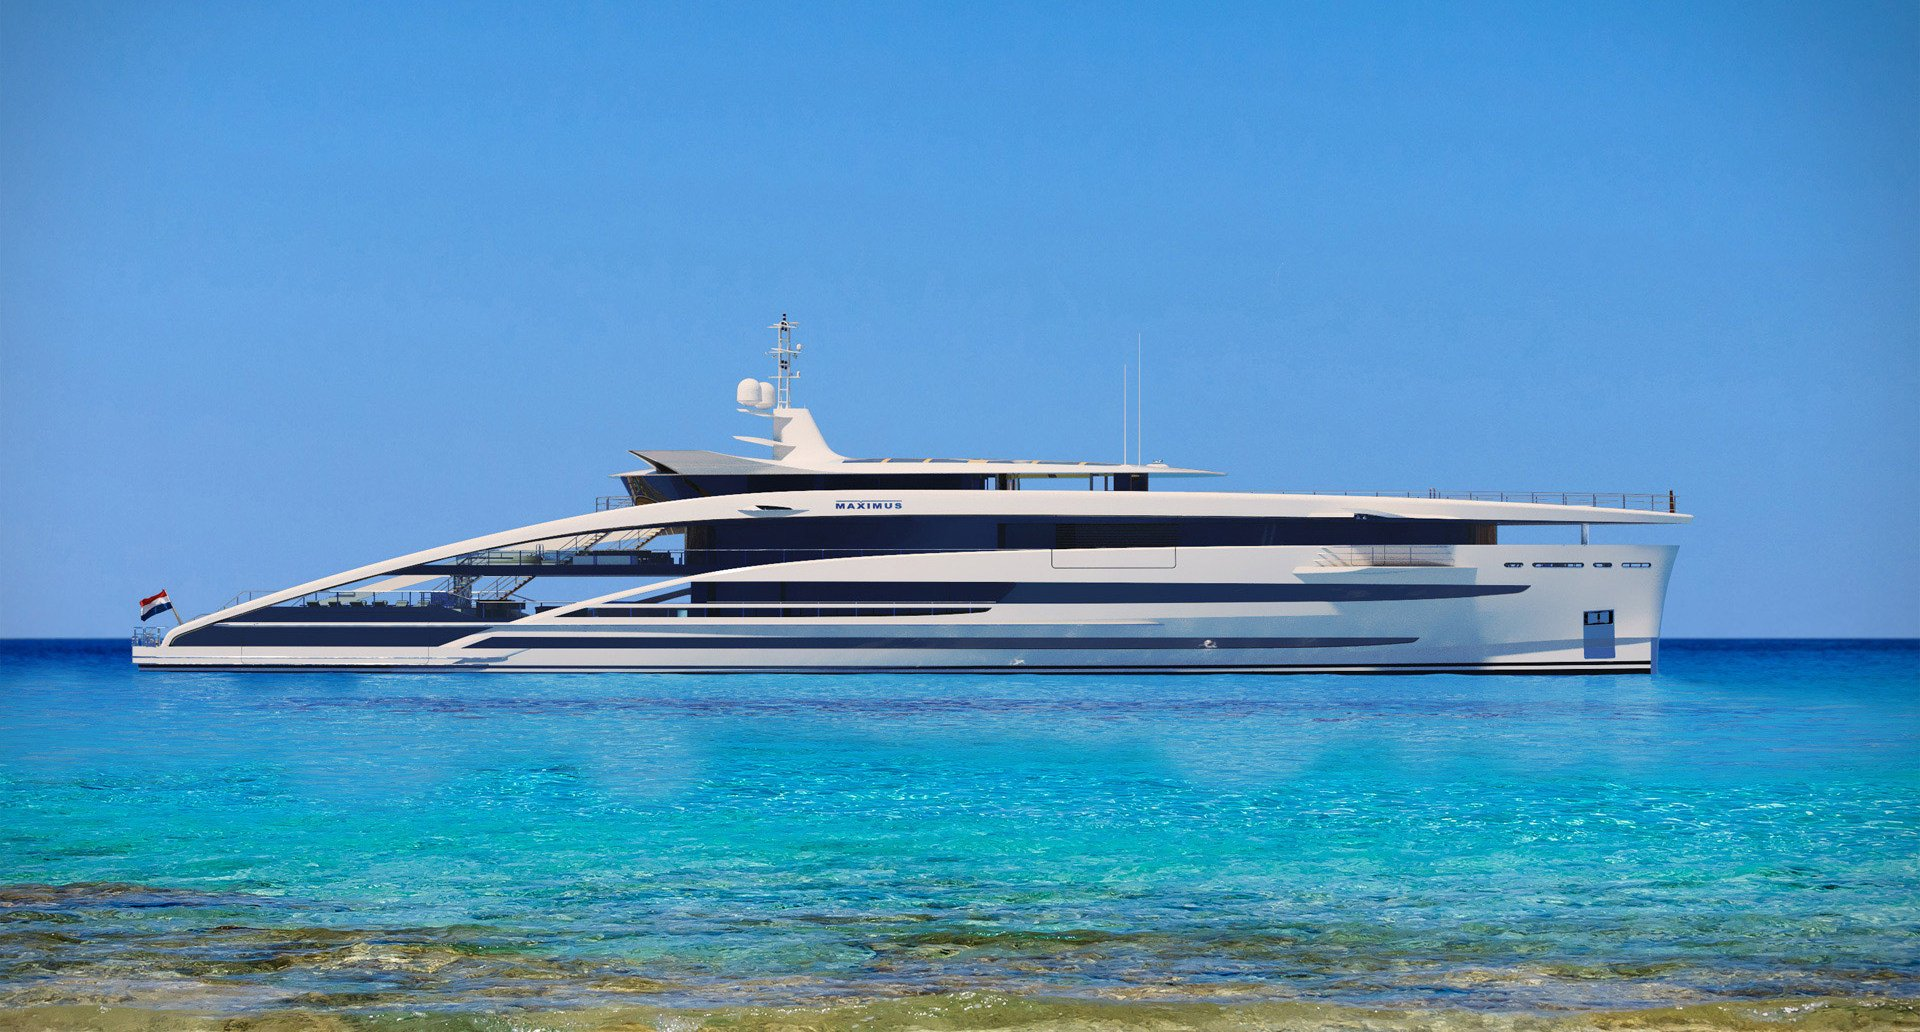 Meet Heesen's largest yacht concept: Project Maximus